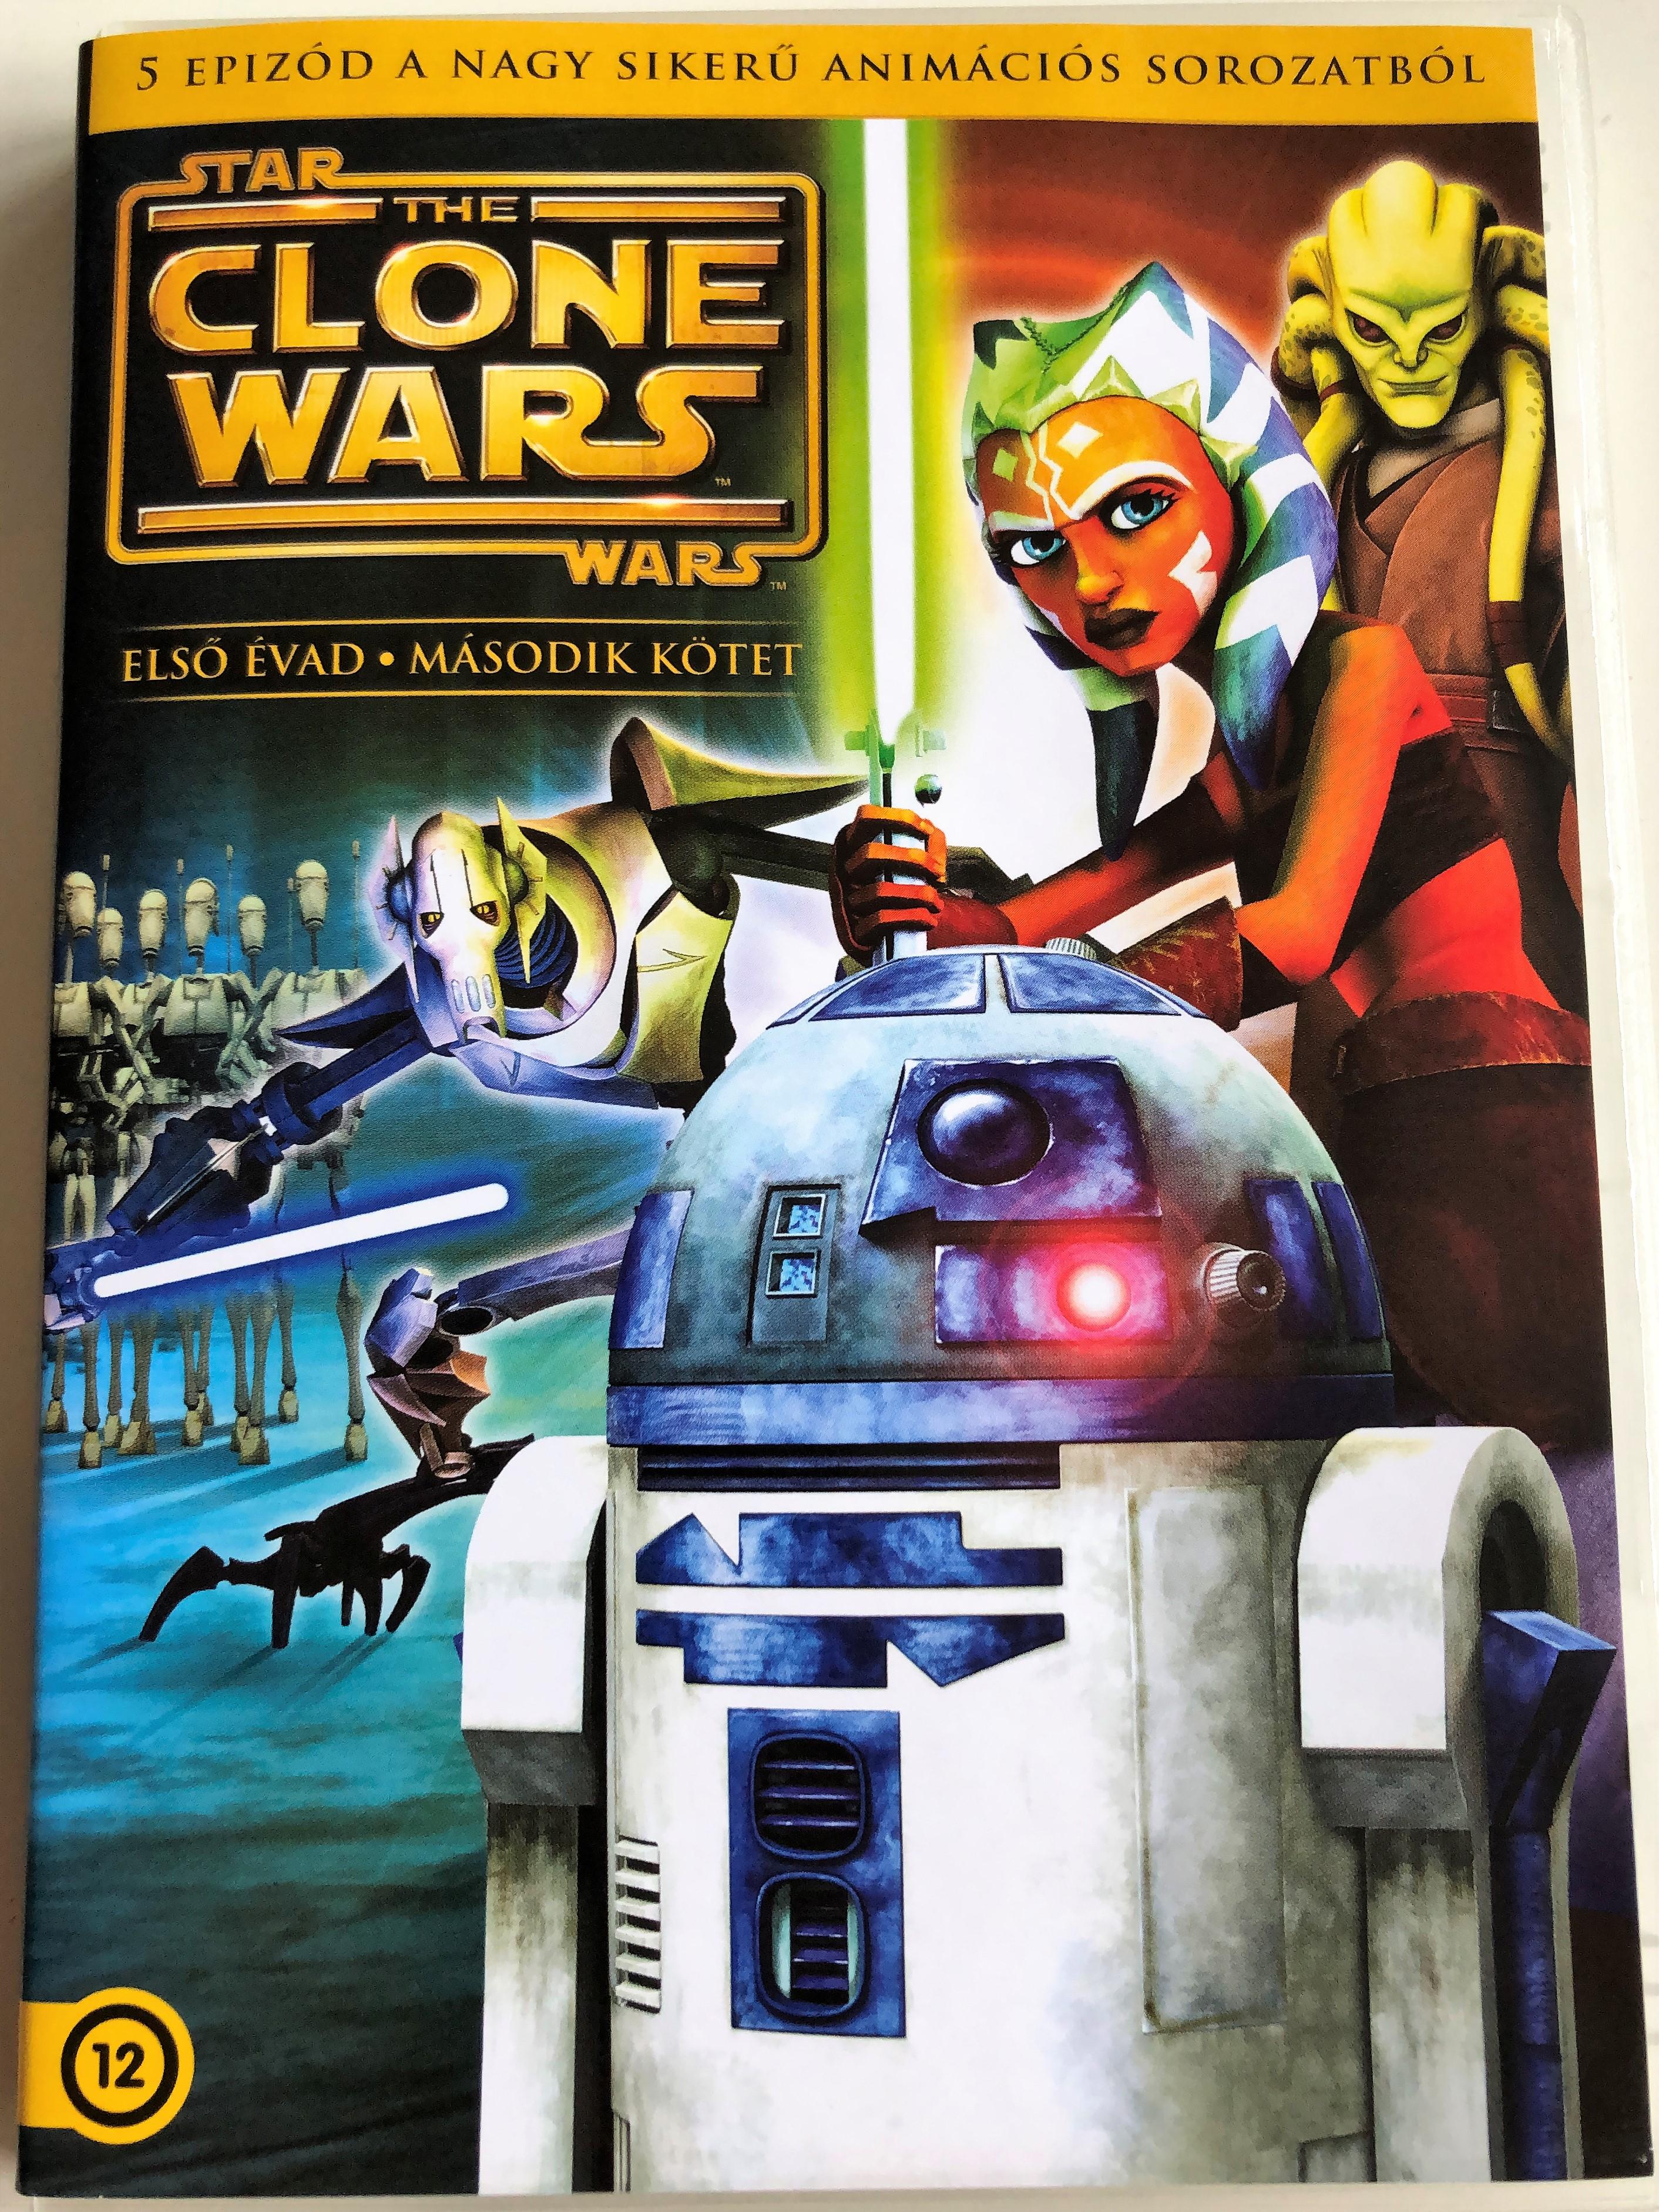 star-wars-the-clone-wars-season-1-volume-2-dvd-2008-star-wars-a-kl-nok-h-bor-ja-els-vad-els-k-tet-animated-tv-series-created-by-george-lucas-5-episodes-on-dvd-1-.jpg